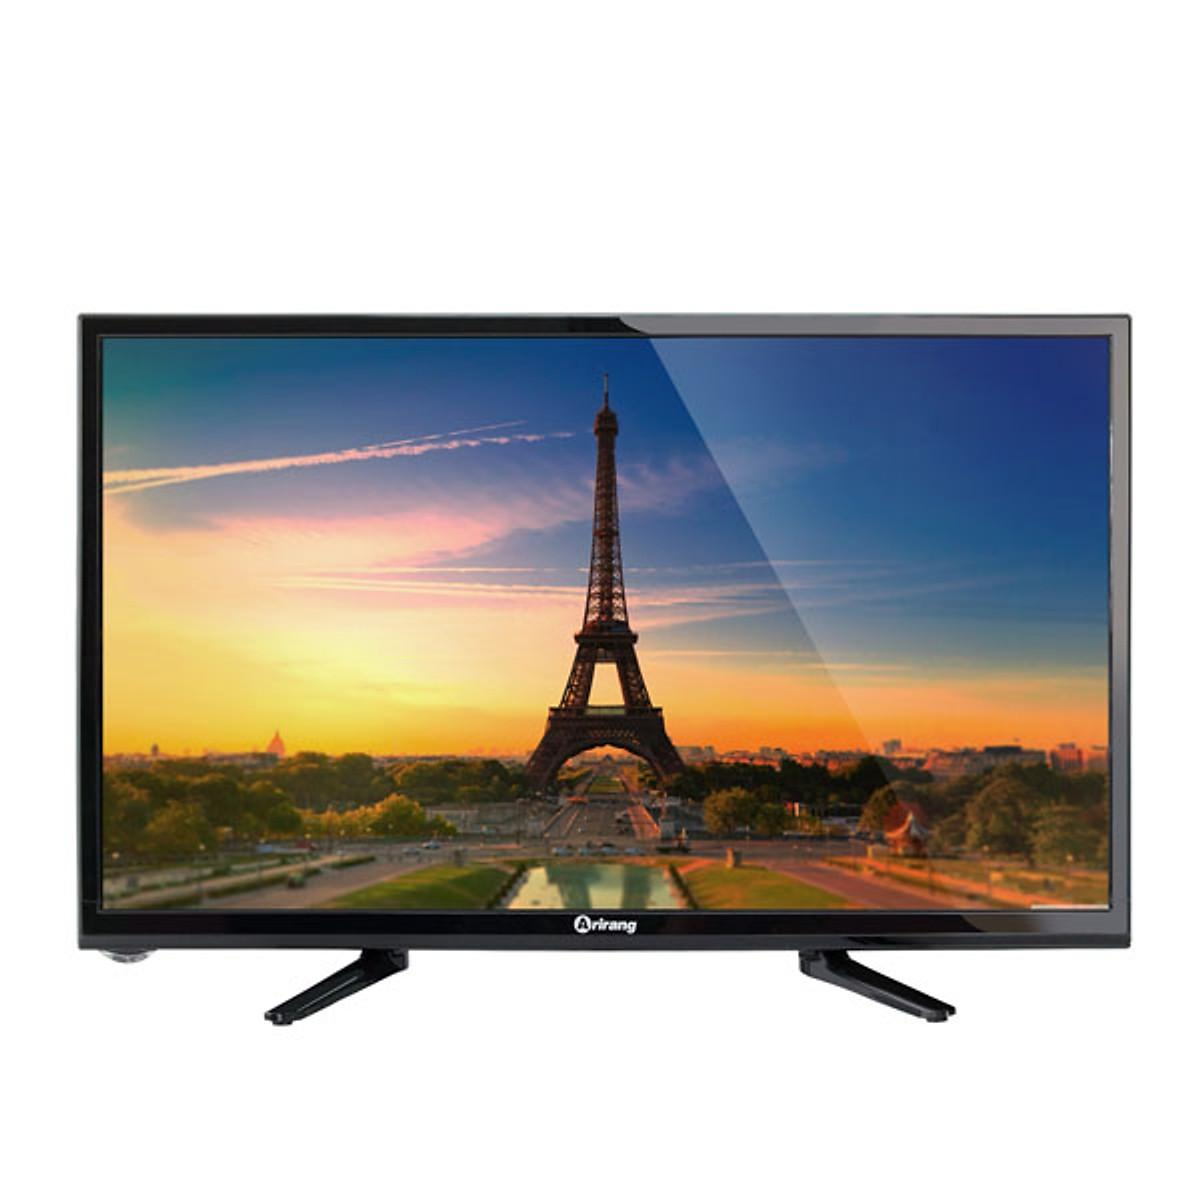 Bảng giá Tivi LED Arirang 24 Inch HD AR-2488G